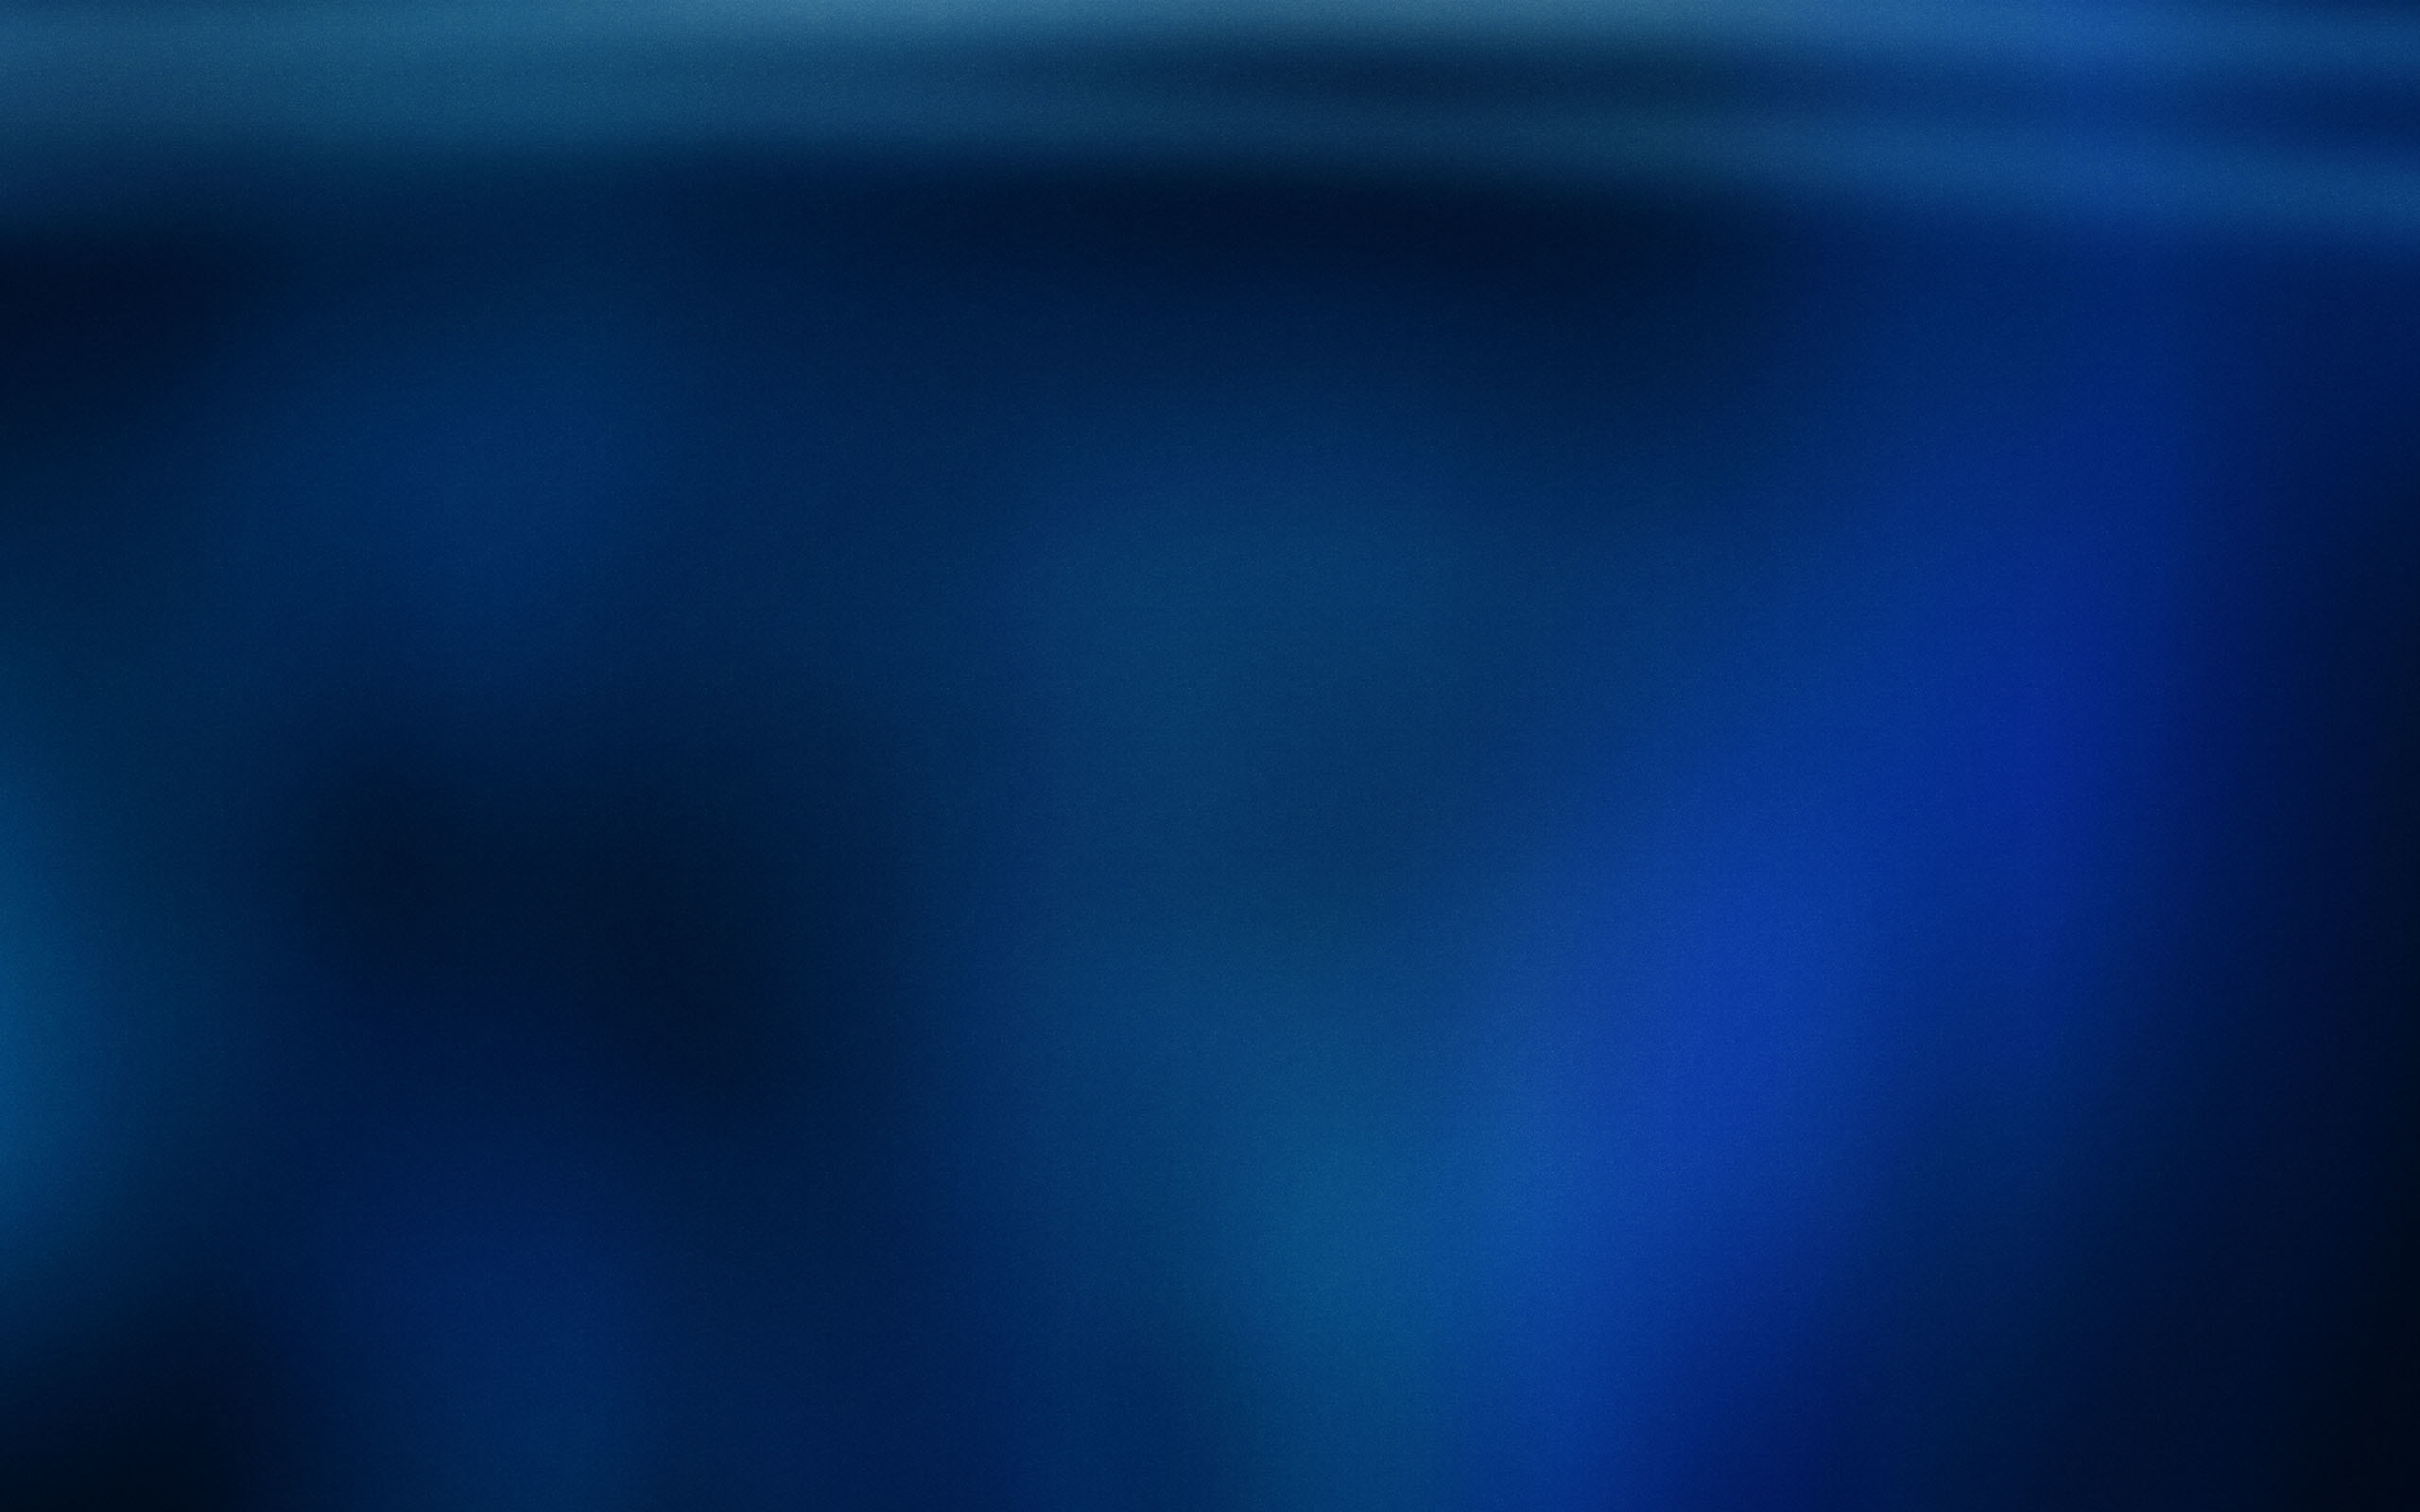 Mac Desktop Wallpapers HD Abstract Blue Desktop Background | Mac .